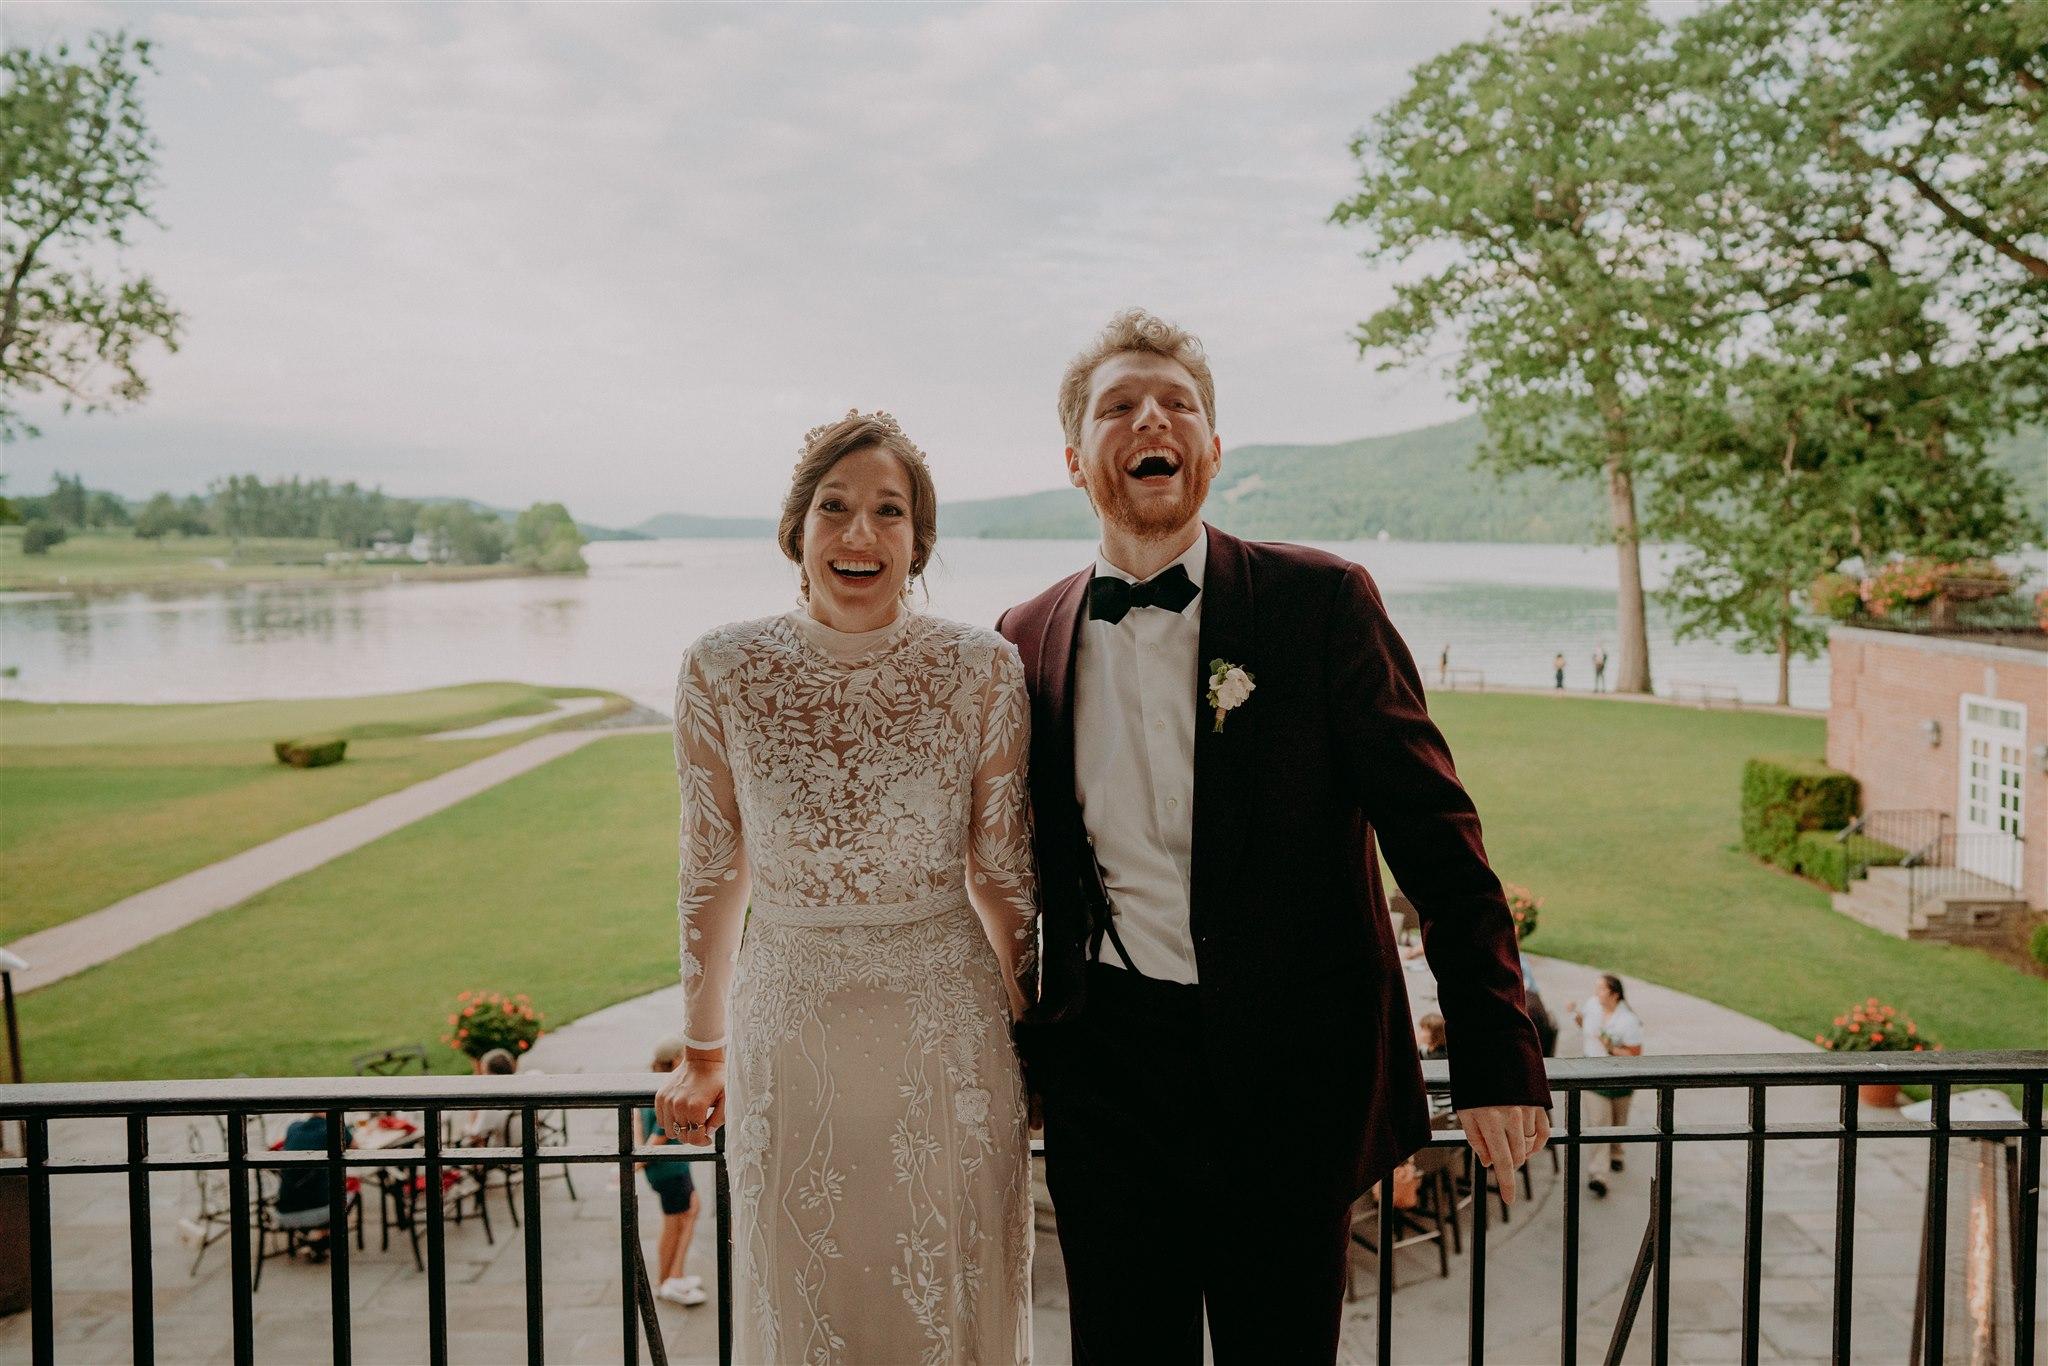 Chellise_Michael_Photography_Hudson_Valley_Wedding_Photographer_Otesaga_Hotel-6074.jpg